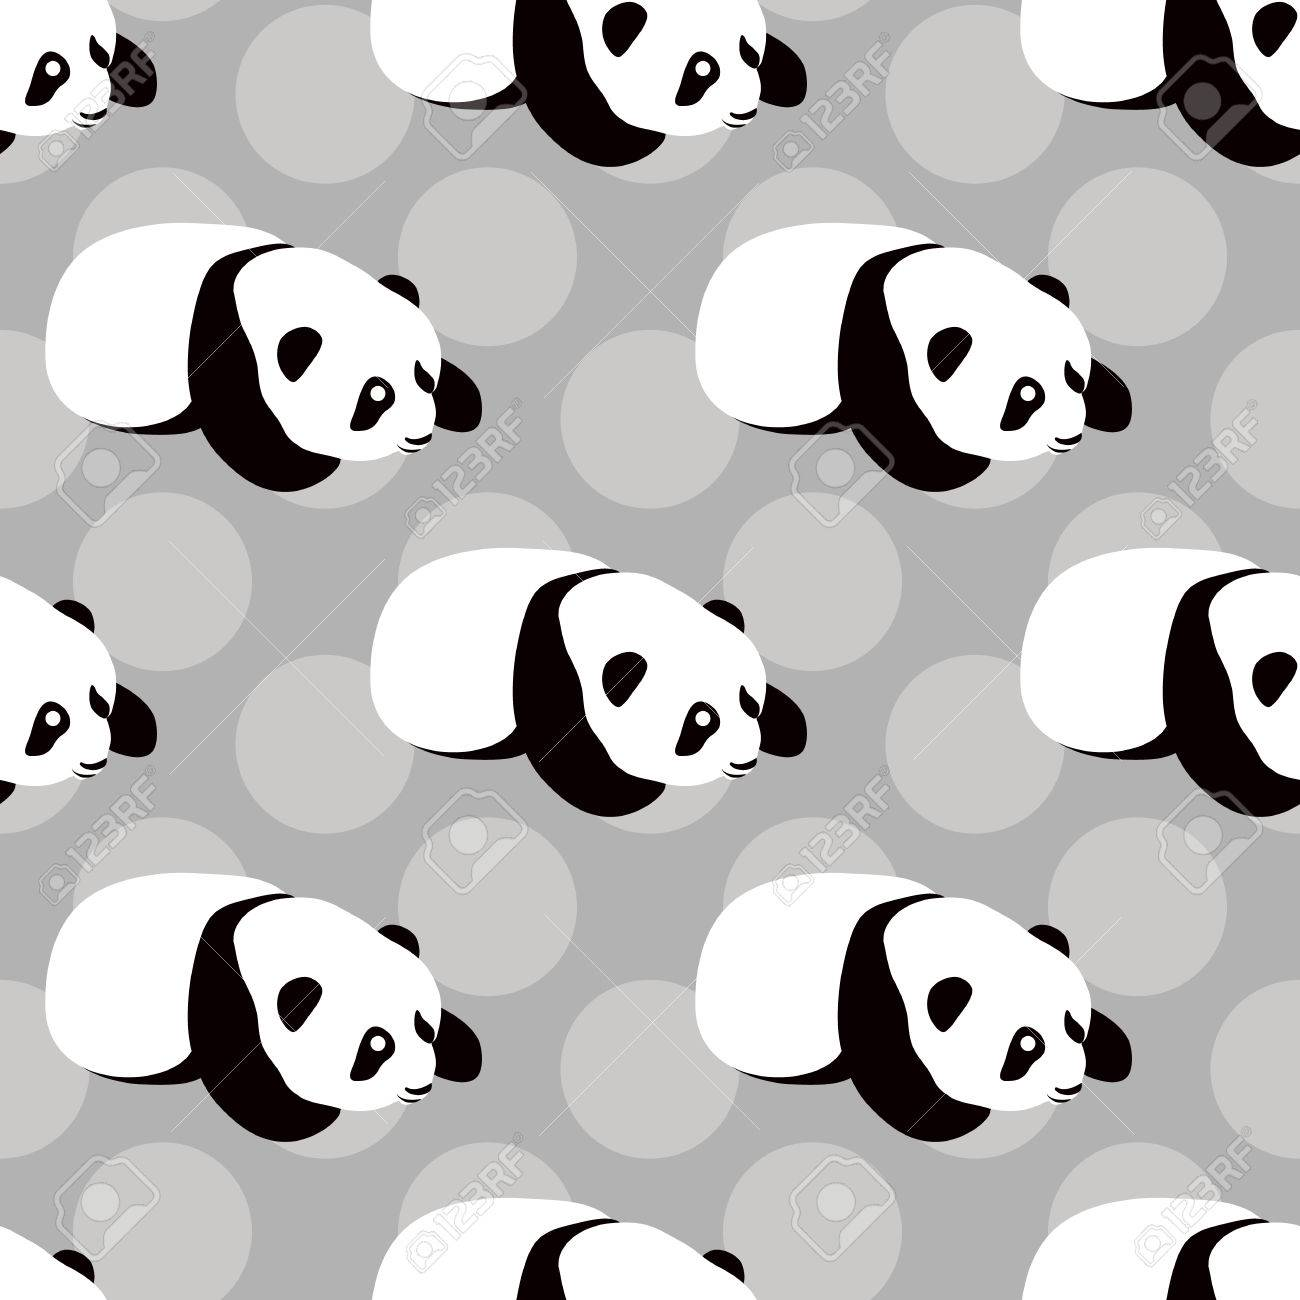 Panda Vecteur Dours De Fond Seamless Avec Mignon Panda Dessin Animé Dormir